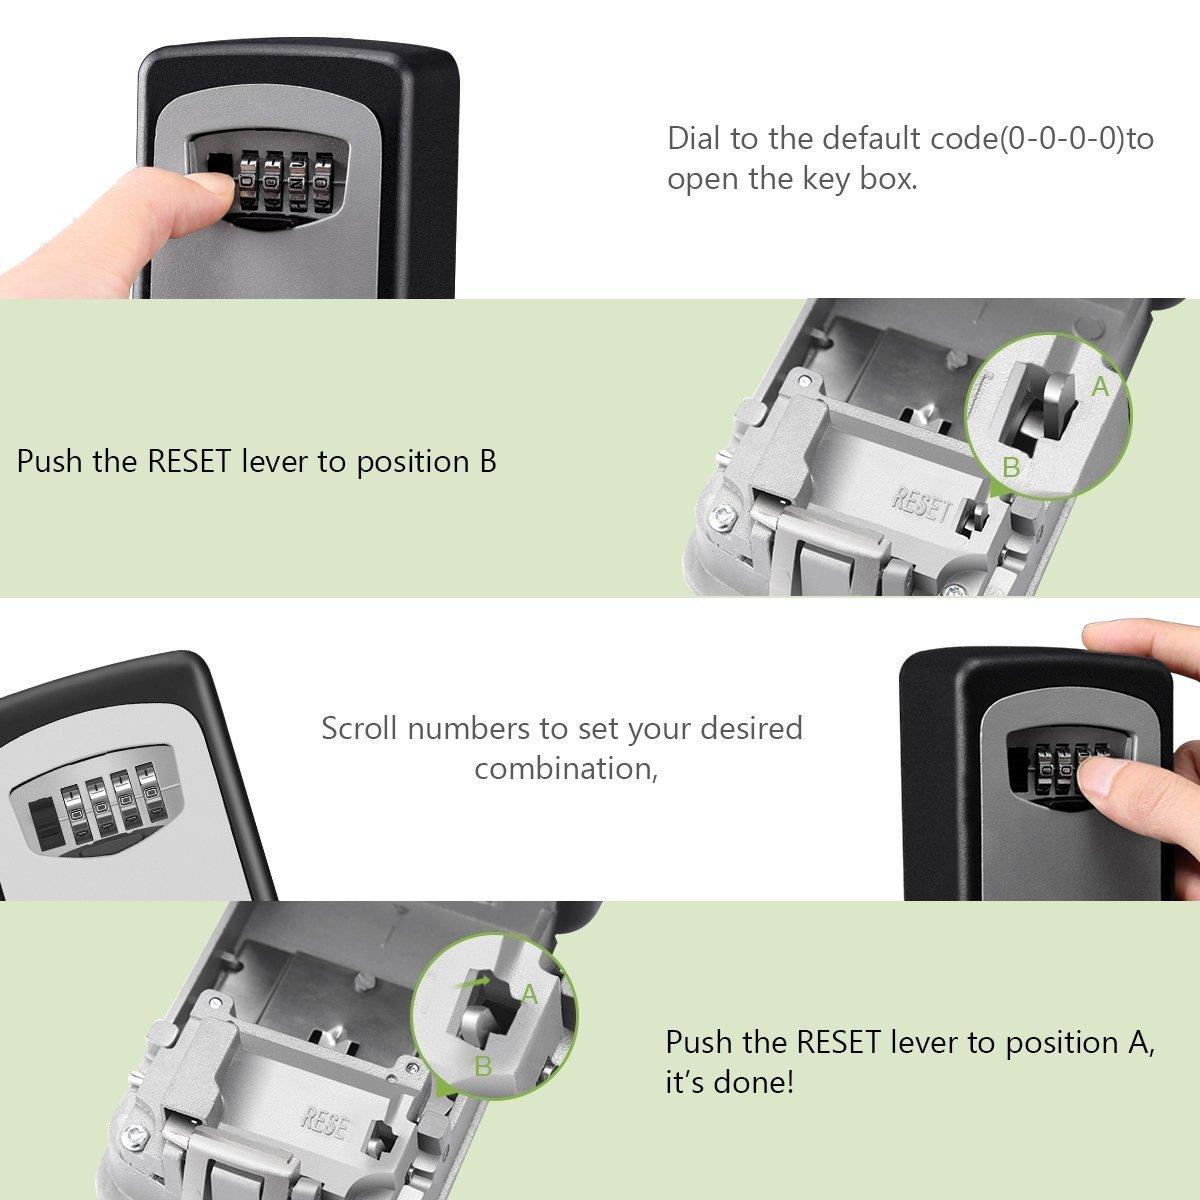 Key Lock Box, Exterior Outdoor Waterproof Hide Wall Mounted Key Safe Box - House use Key Storage Lock Box by YA MI (Image #4)